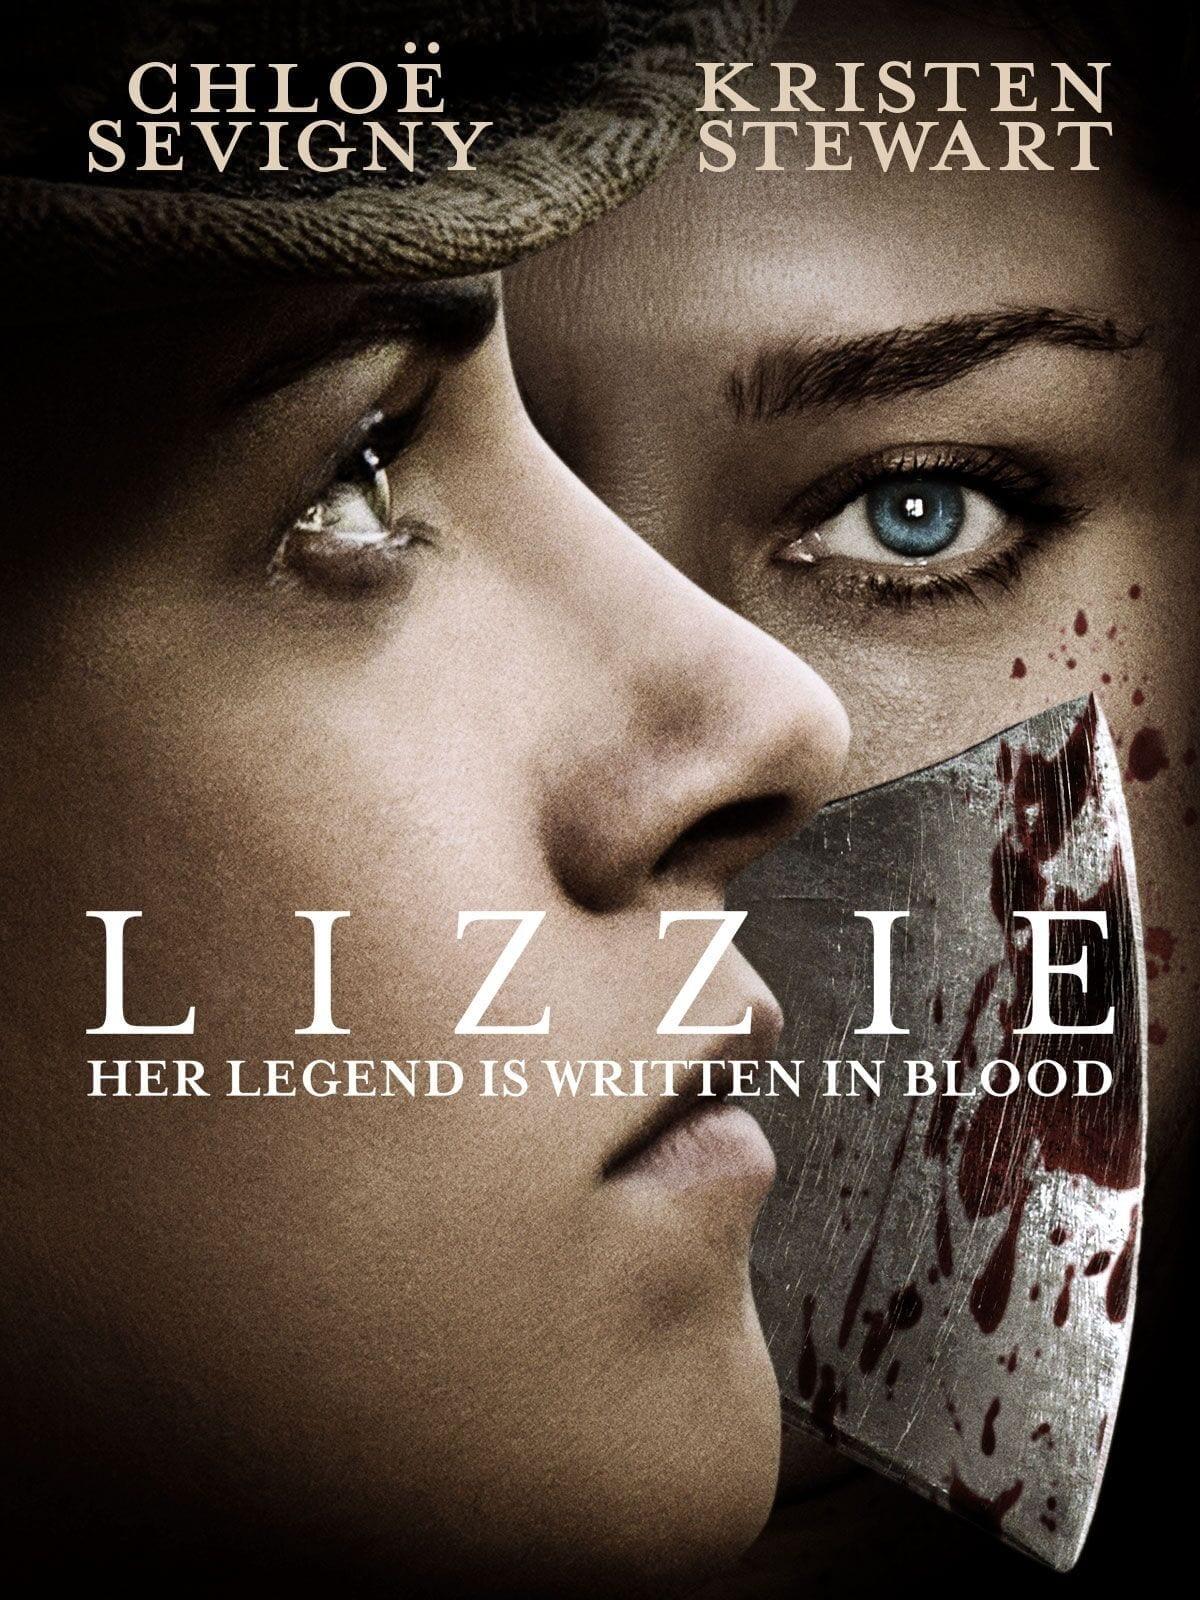 Poster for Lizzie starring Chloe Sevigny and Kristen Stewart